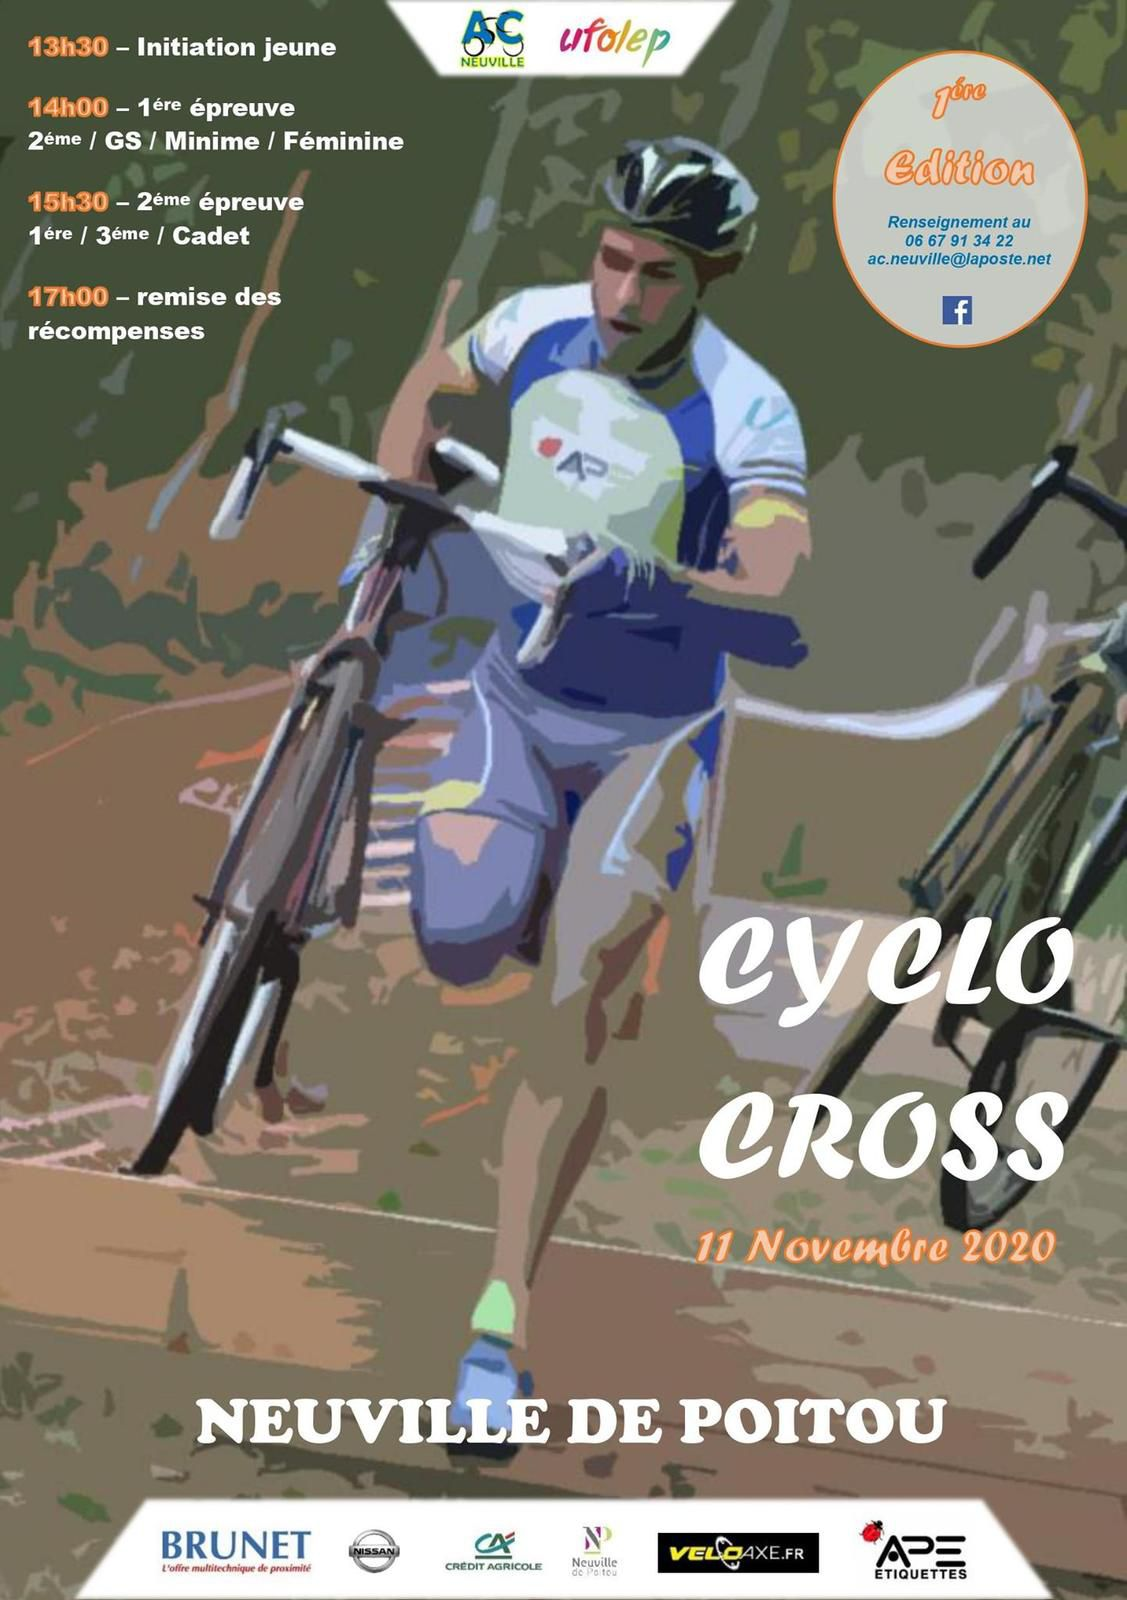 MERCREDI 11 NOVEMBRE 2020 / CYCLO CROSS A NEUVILLE 86